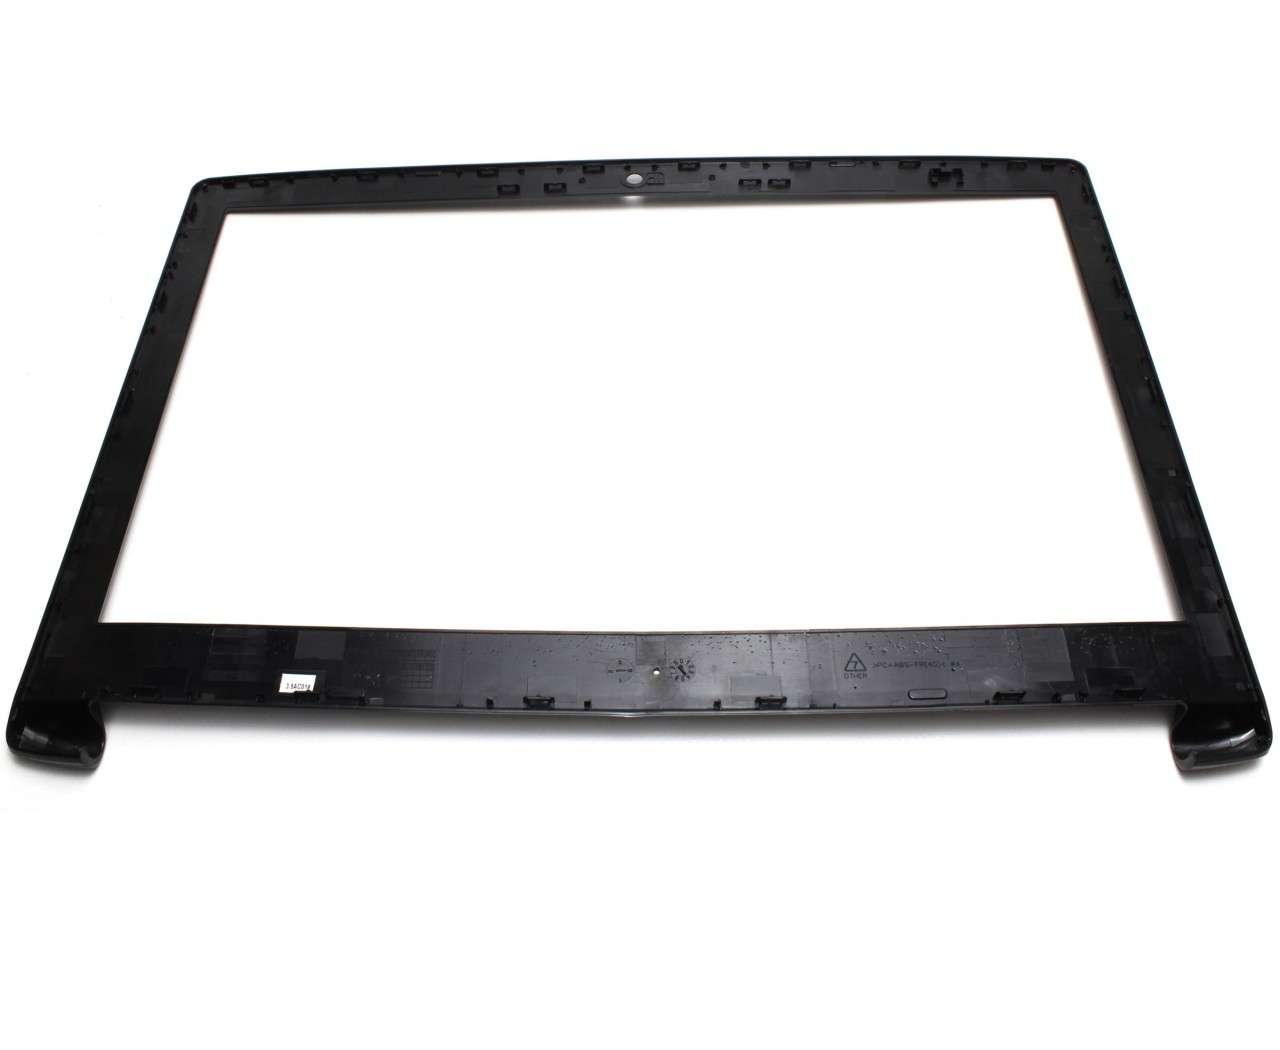 Rama Display Acer Aspire 6 A615-51 Bezel Front Cover Neagra imagine powerlaptop.ro 2021